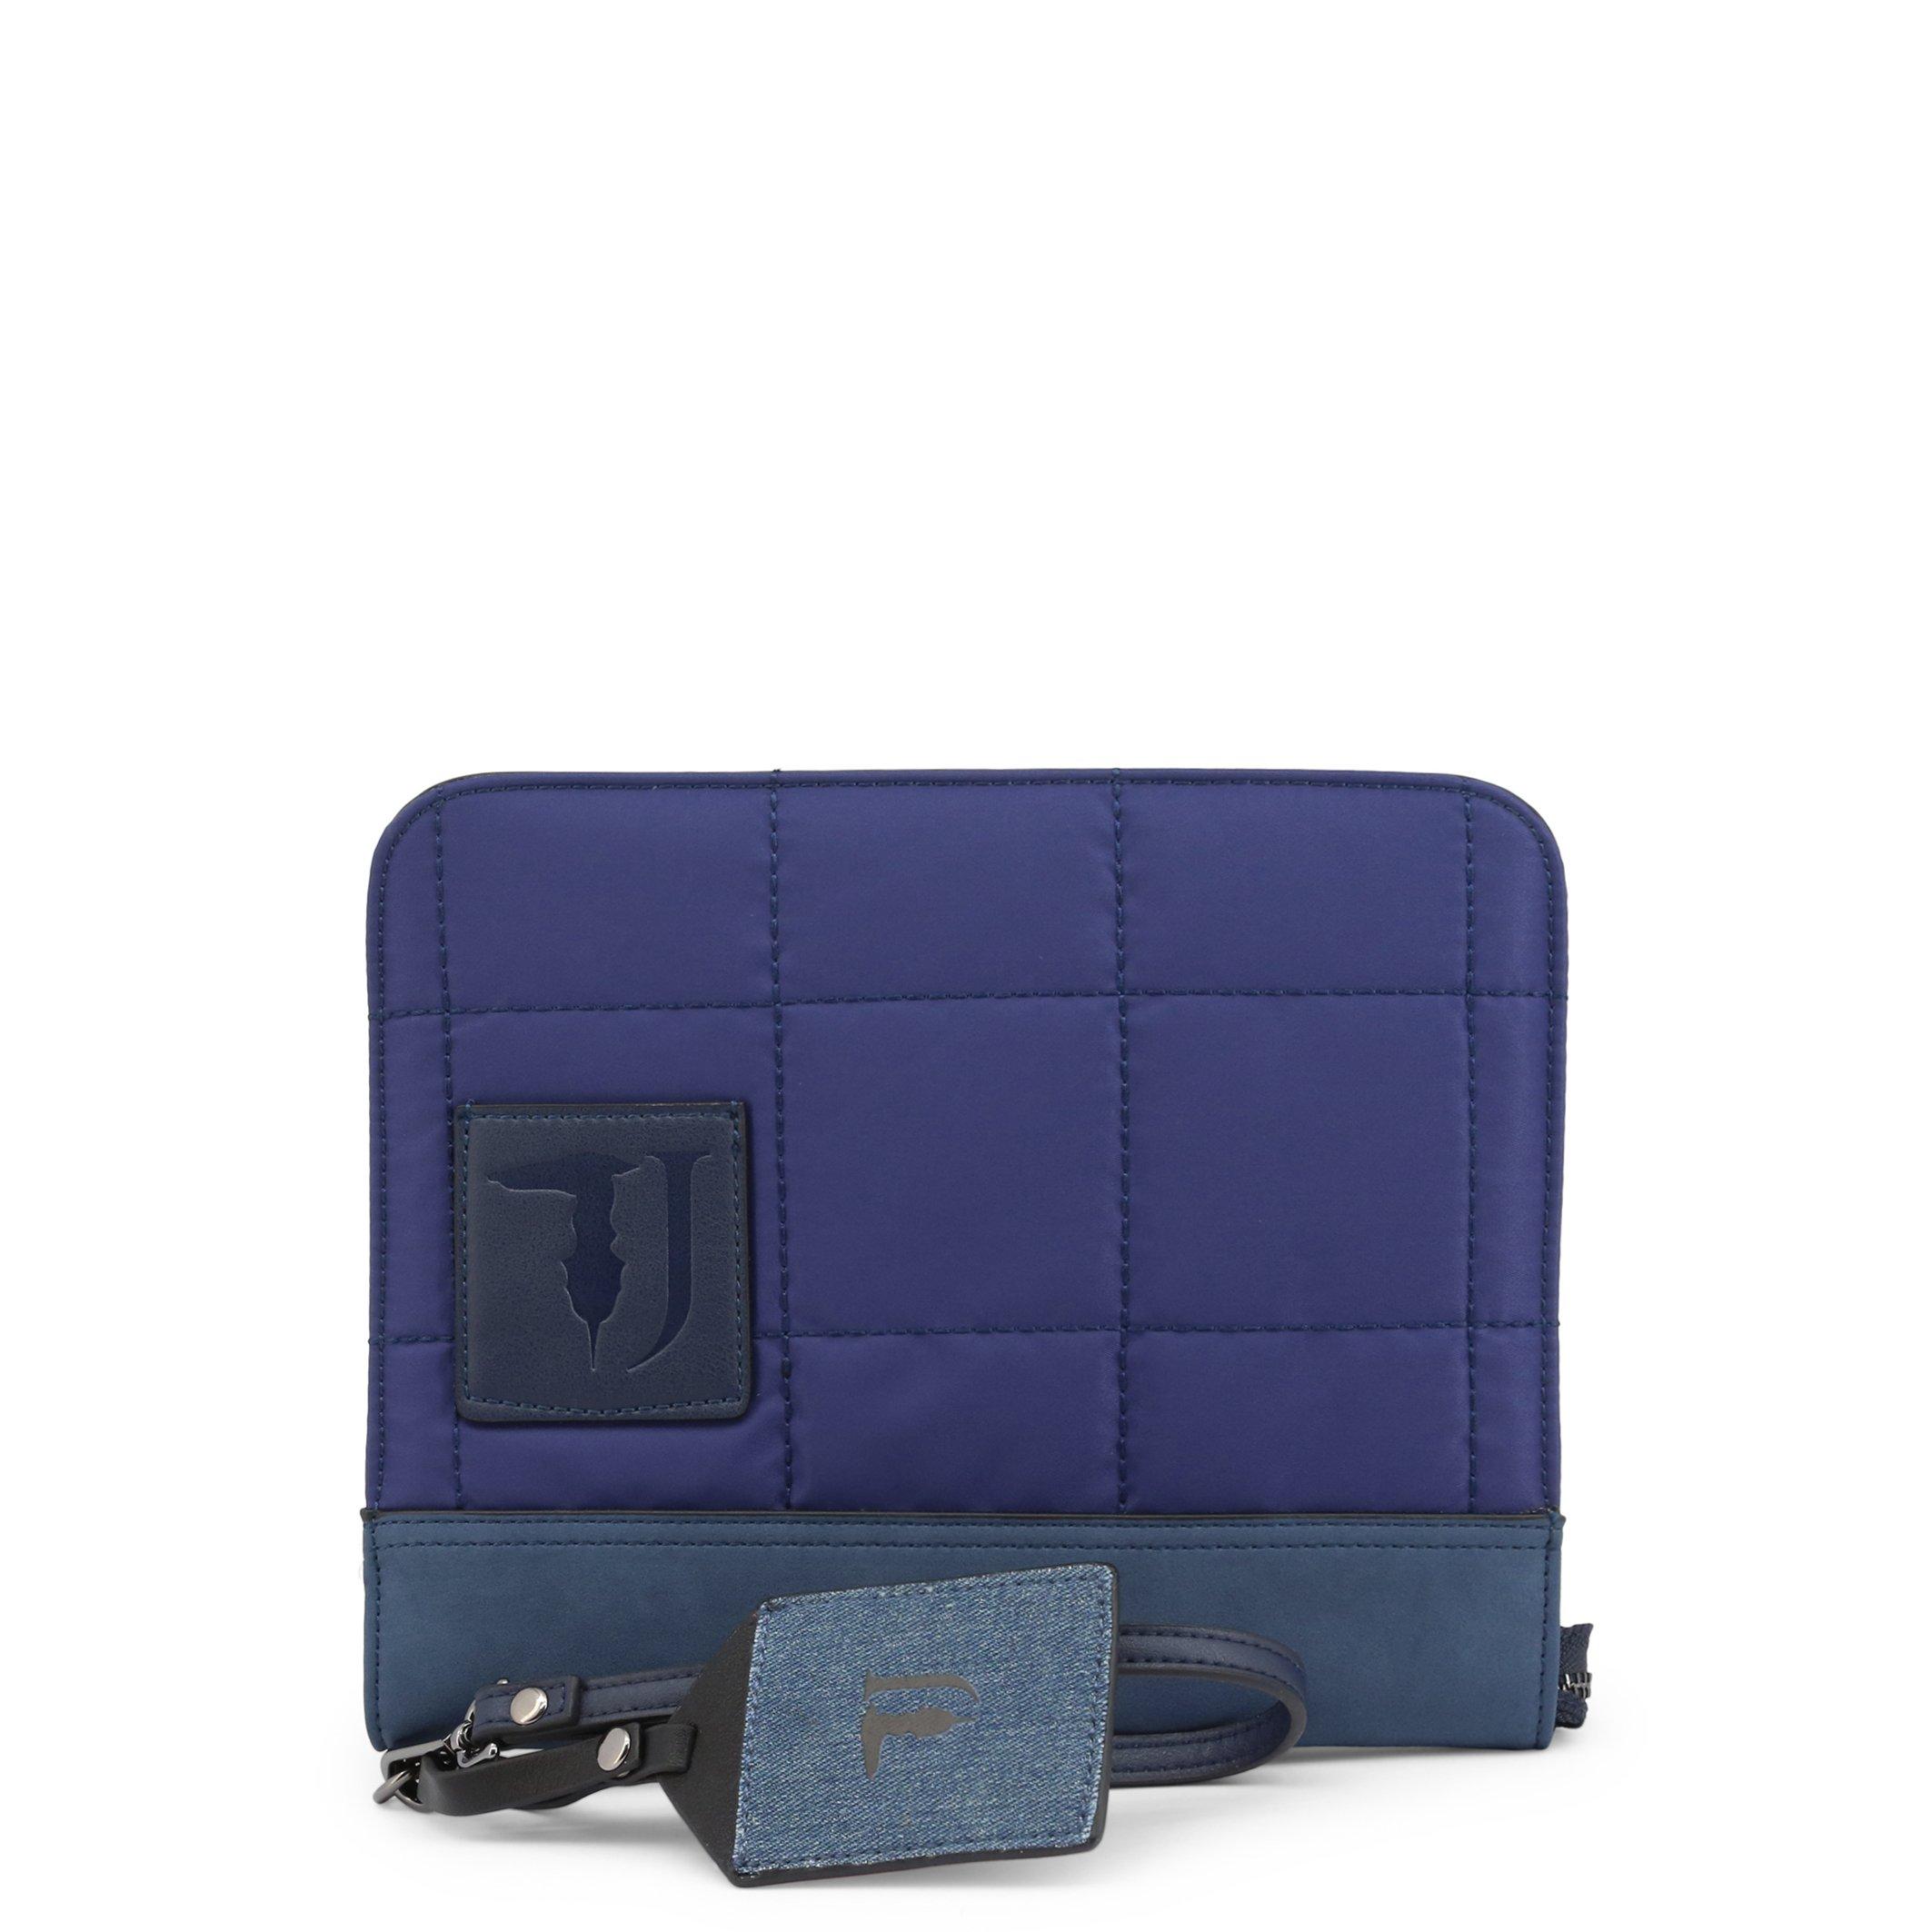 Trussardi Women's Handbag Various Colours TICINESE_71B00105-99 - blue-1 NOSIZE